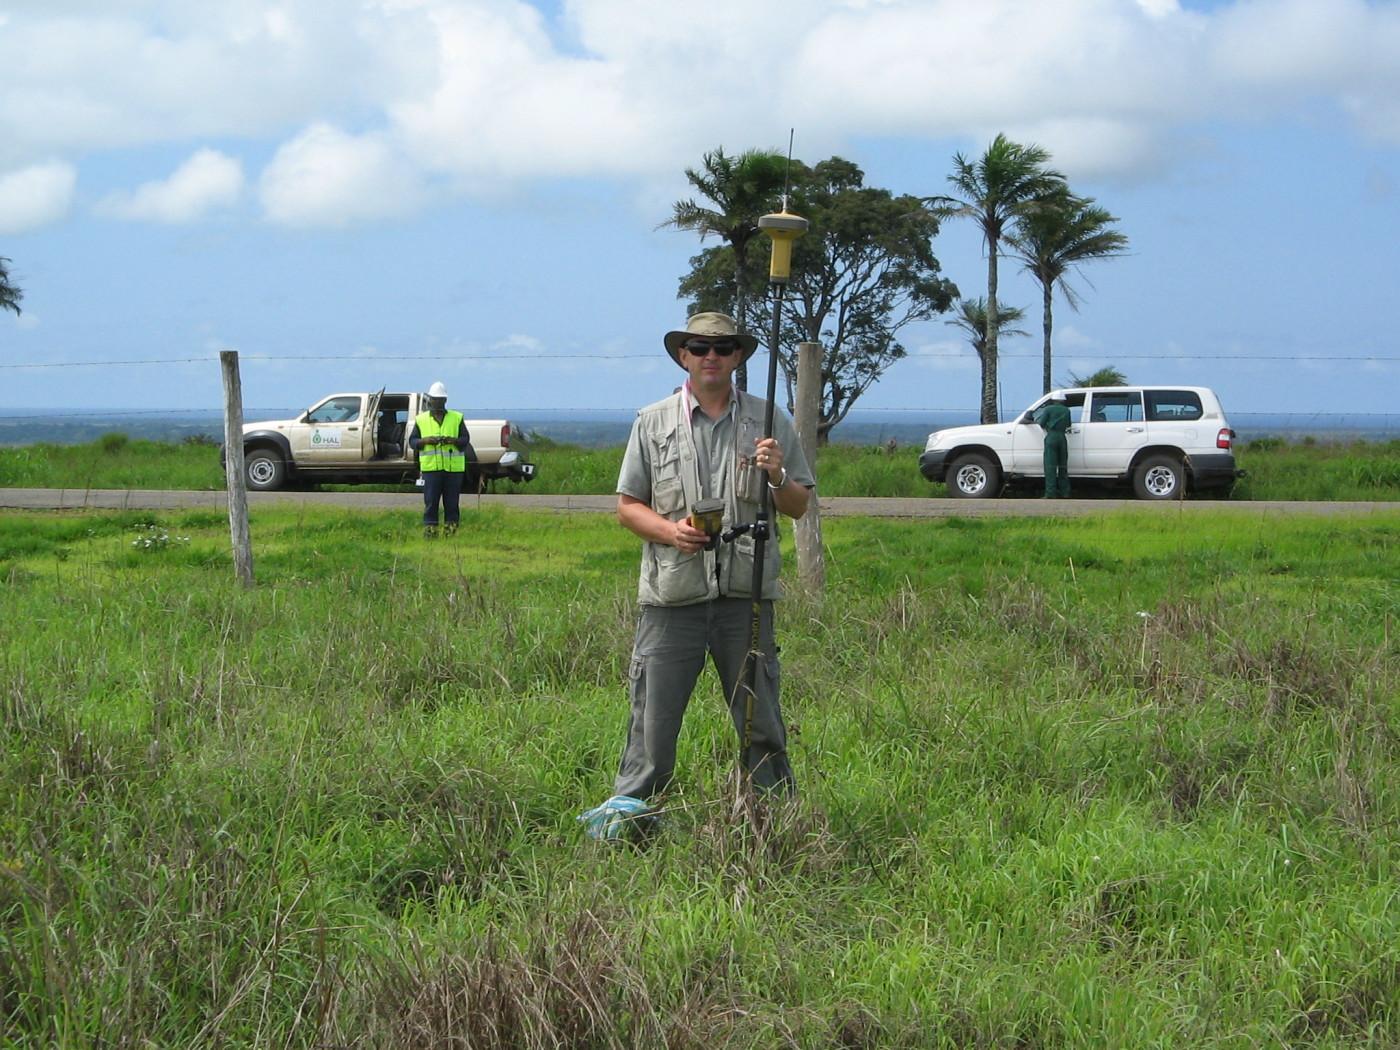 Angola-Cabinda Surveyor